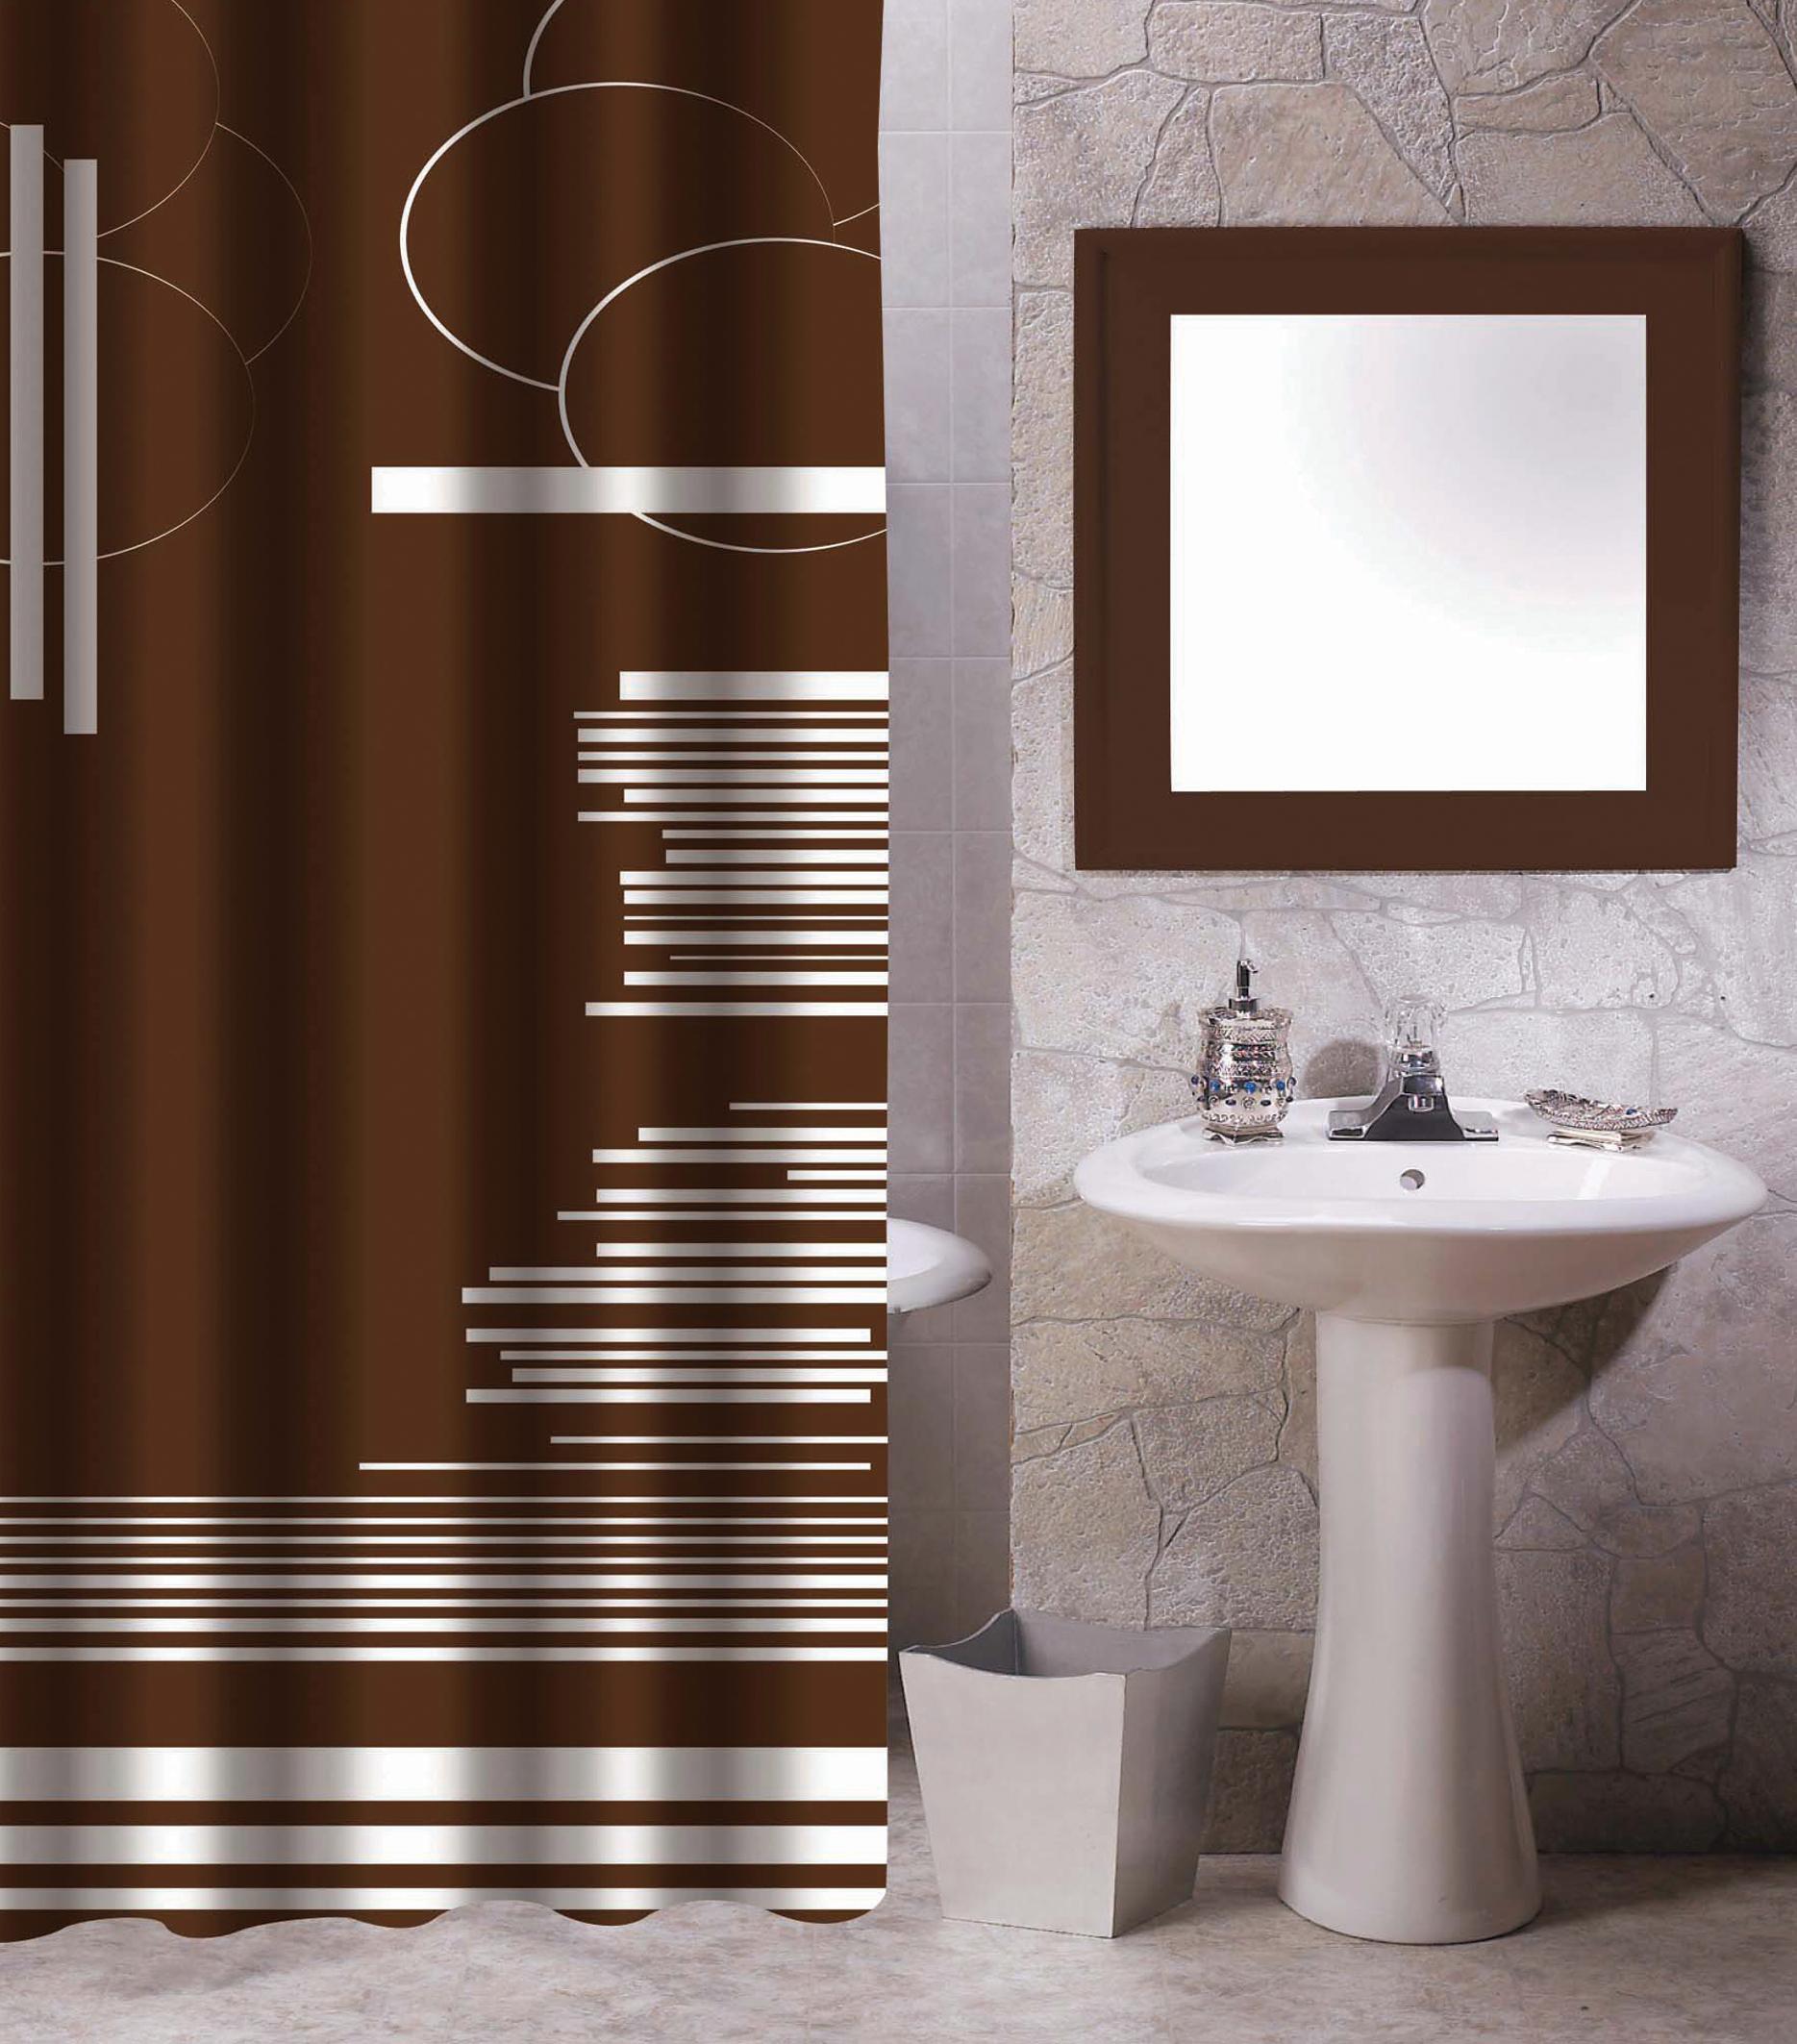 MSV Duschvorhang 180x200cm Anti Schimmel Textil Badewannenvorhang Wannenvorhang Grafik Braun